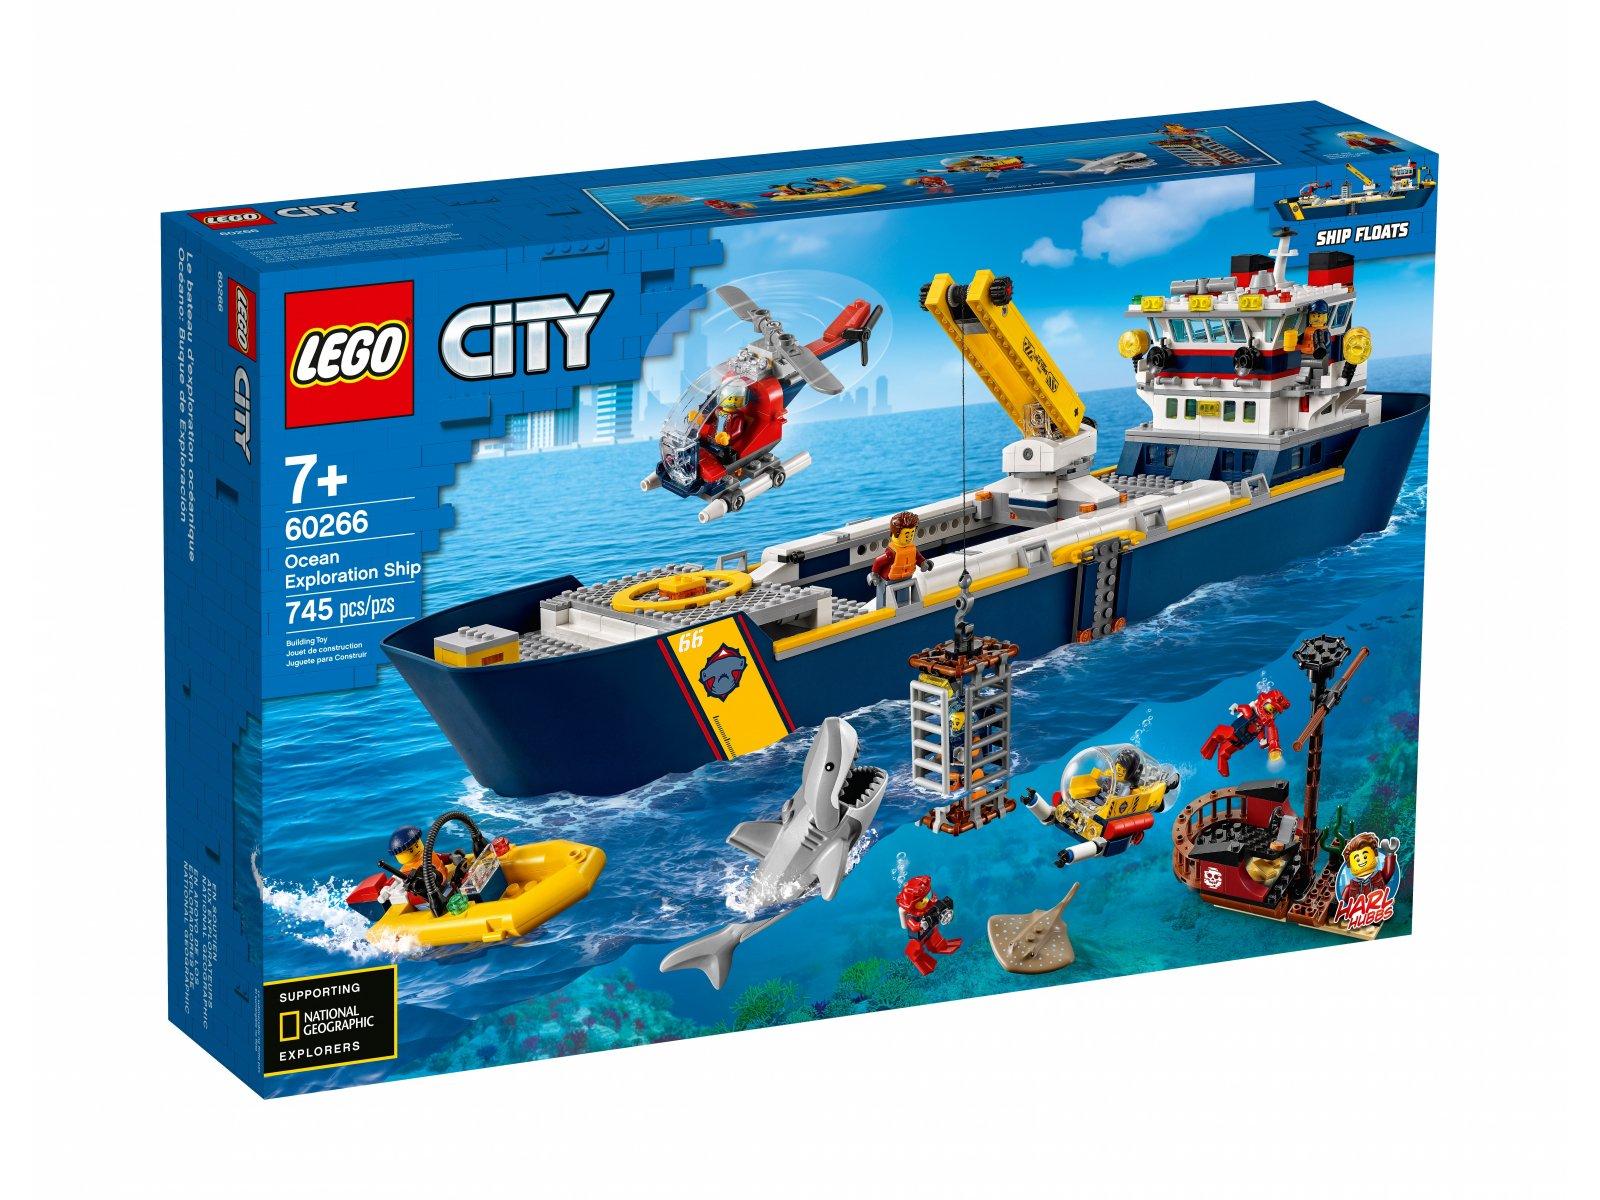 LEGO City 60266 Statek badaczy oceanu